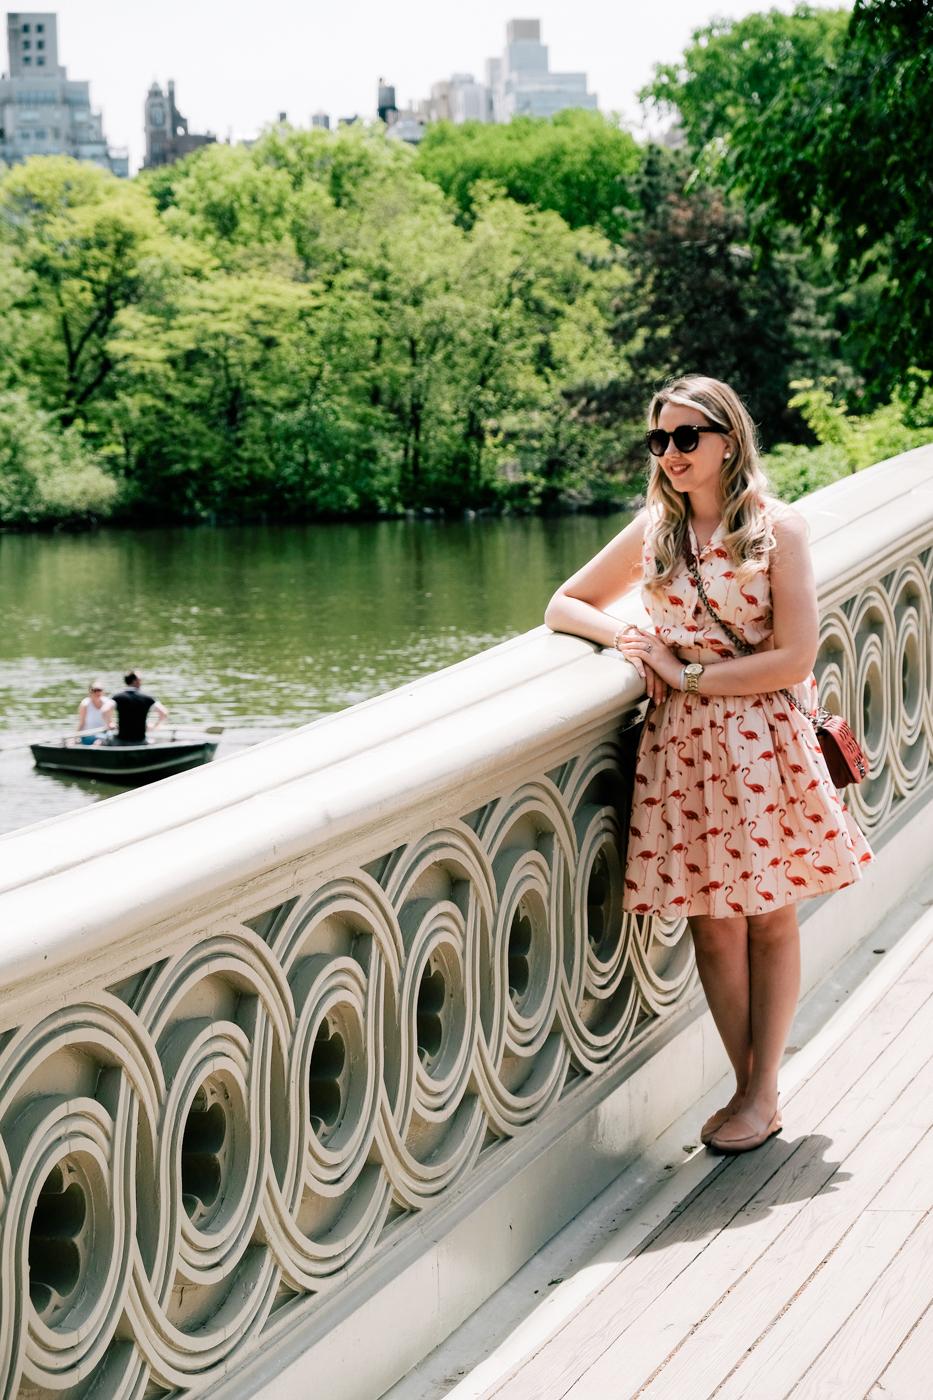 Debora Dahl, bow bridge, central park in the spring, flamingo dress